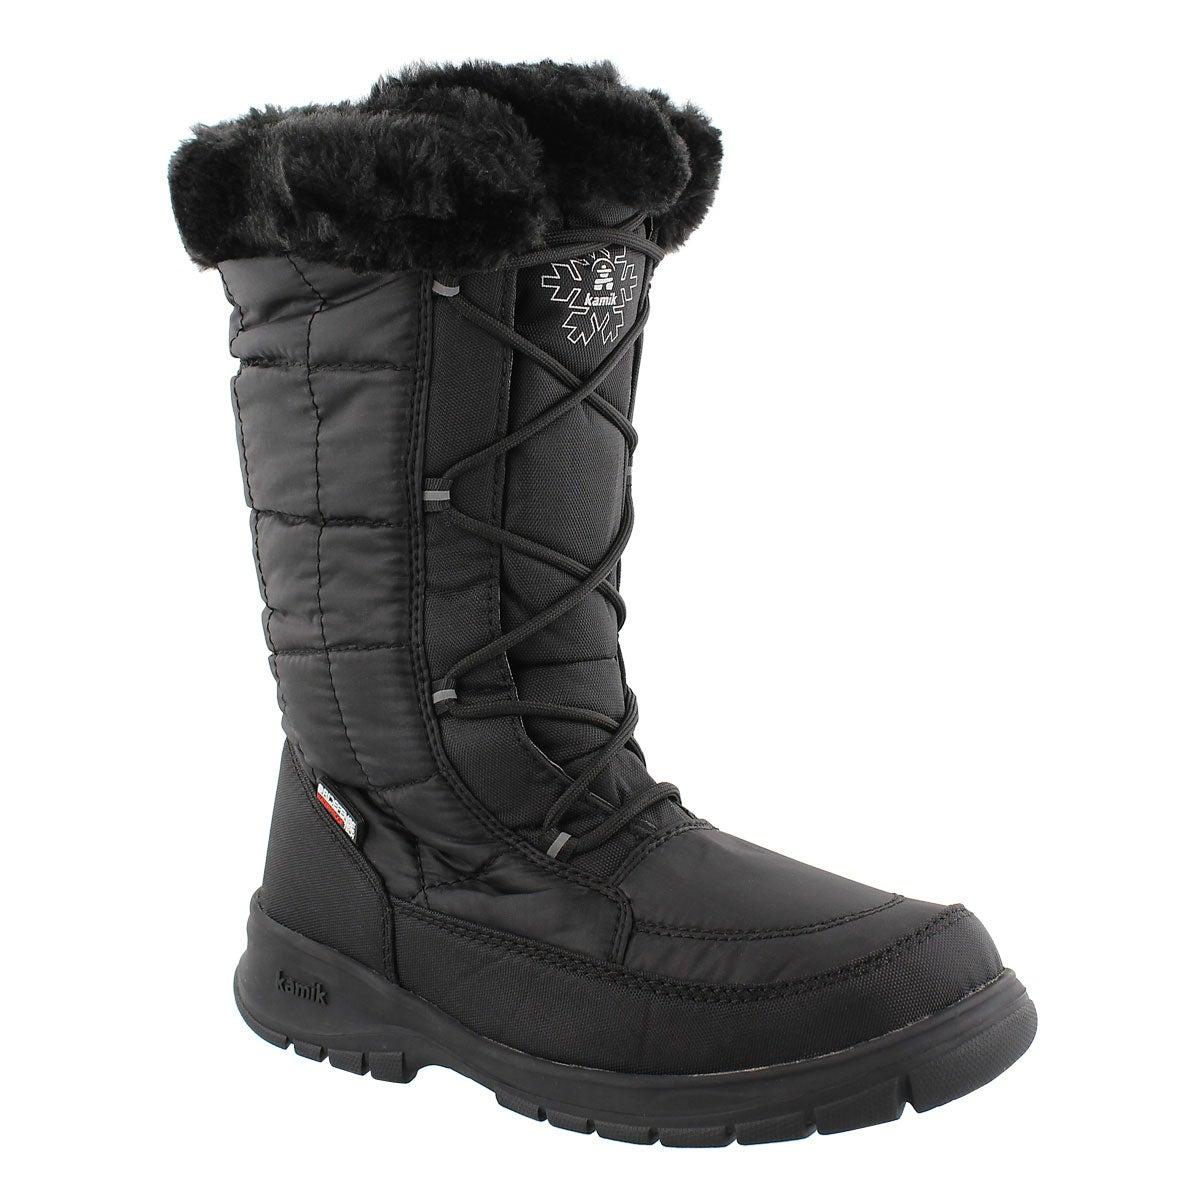 Kamik Women's New York 2 Waterproof Winter Boot- WIDE